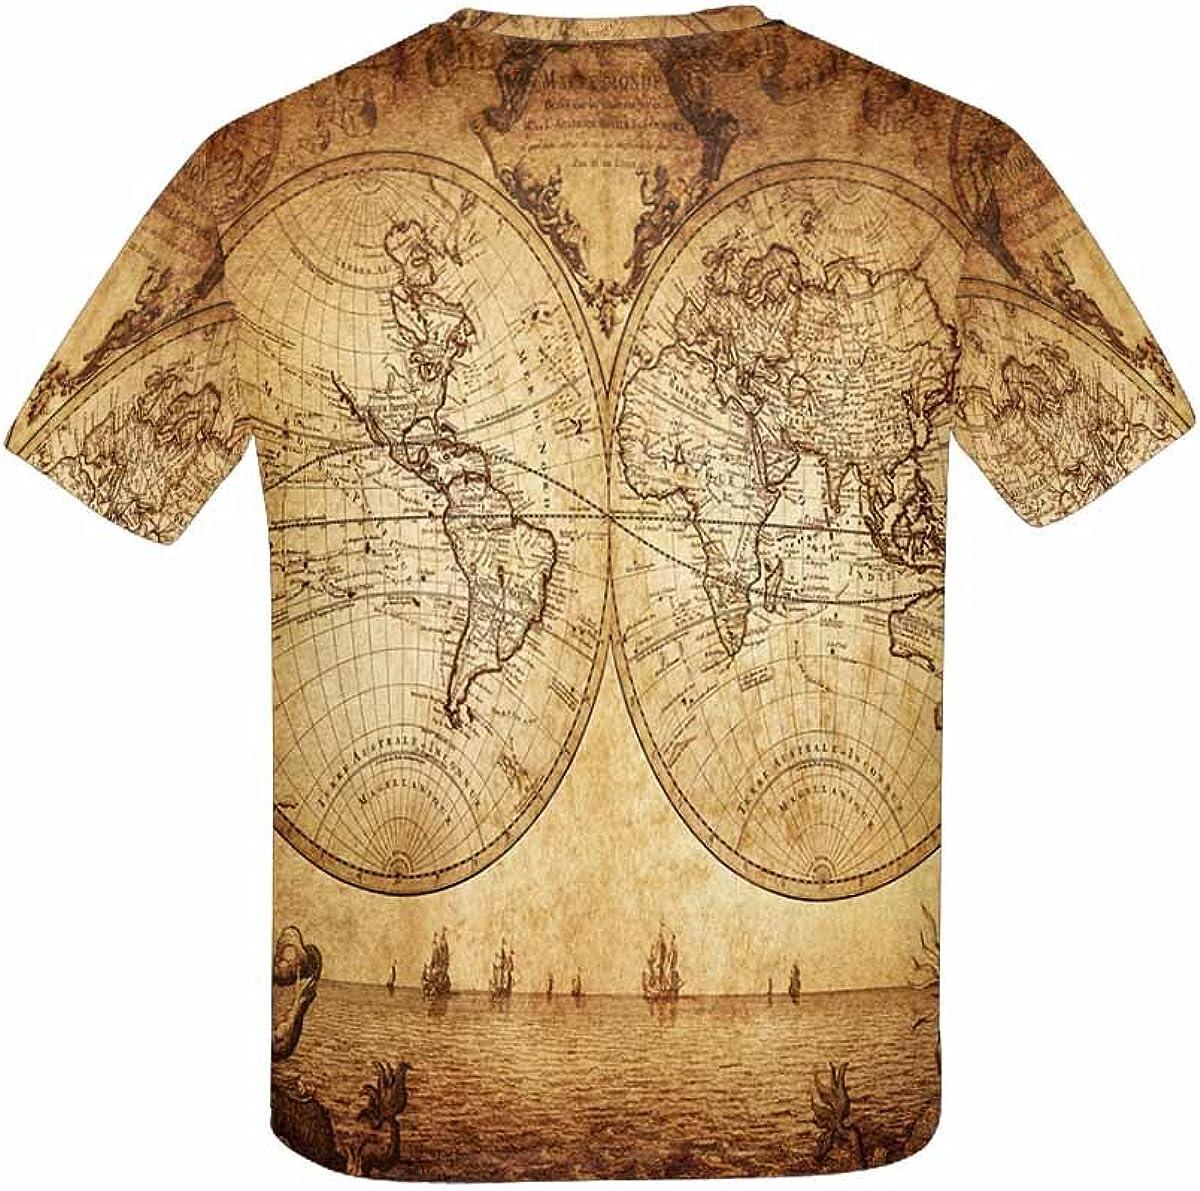 XS-XL INTERESTPRINT Kids T-Shirts Vintage Map of The World